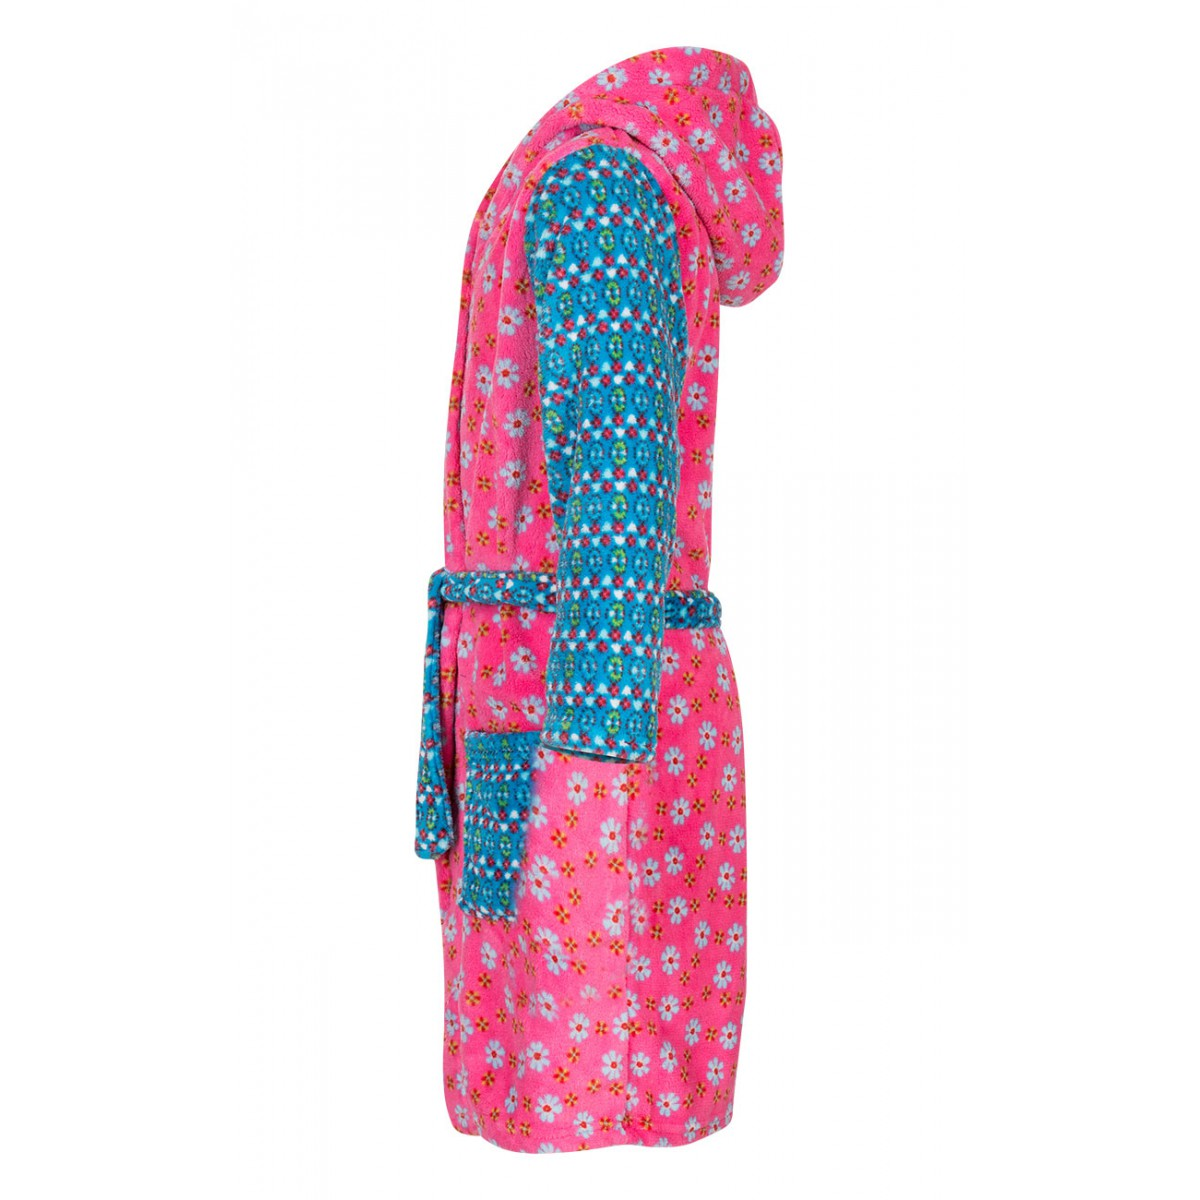 bjnl -kinderbadjas met bloemen